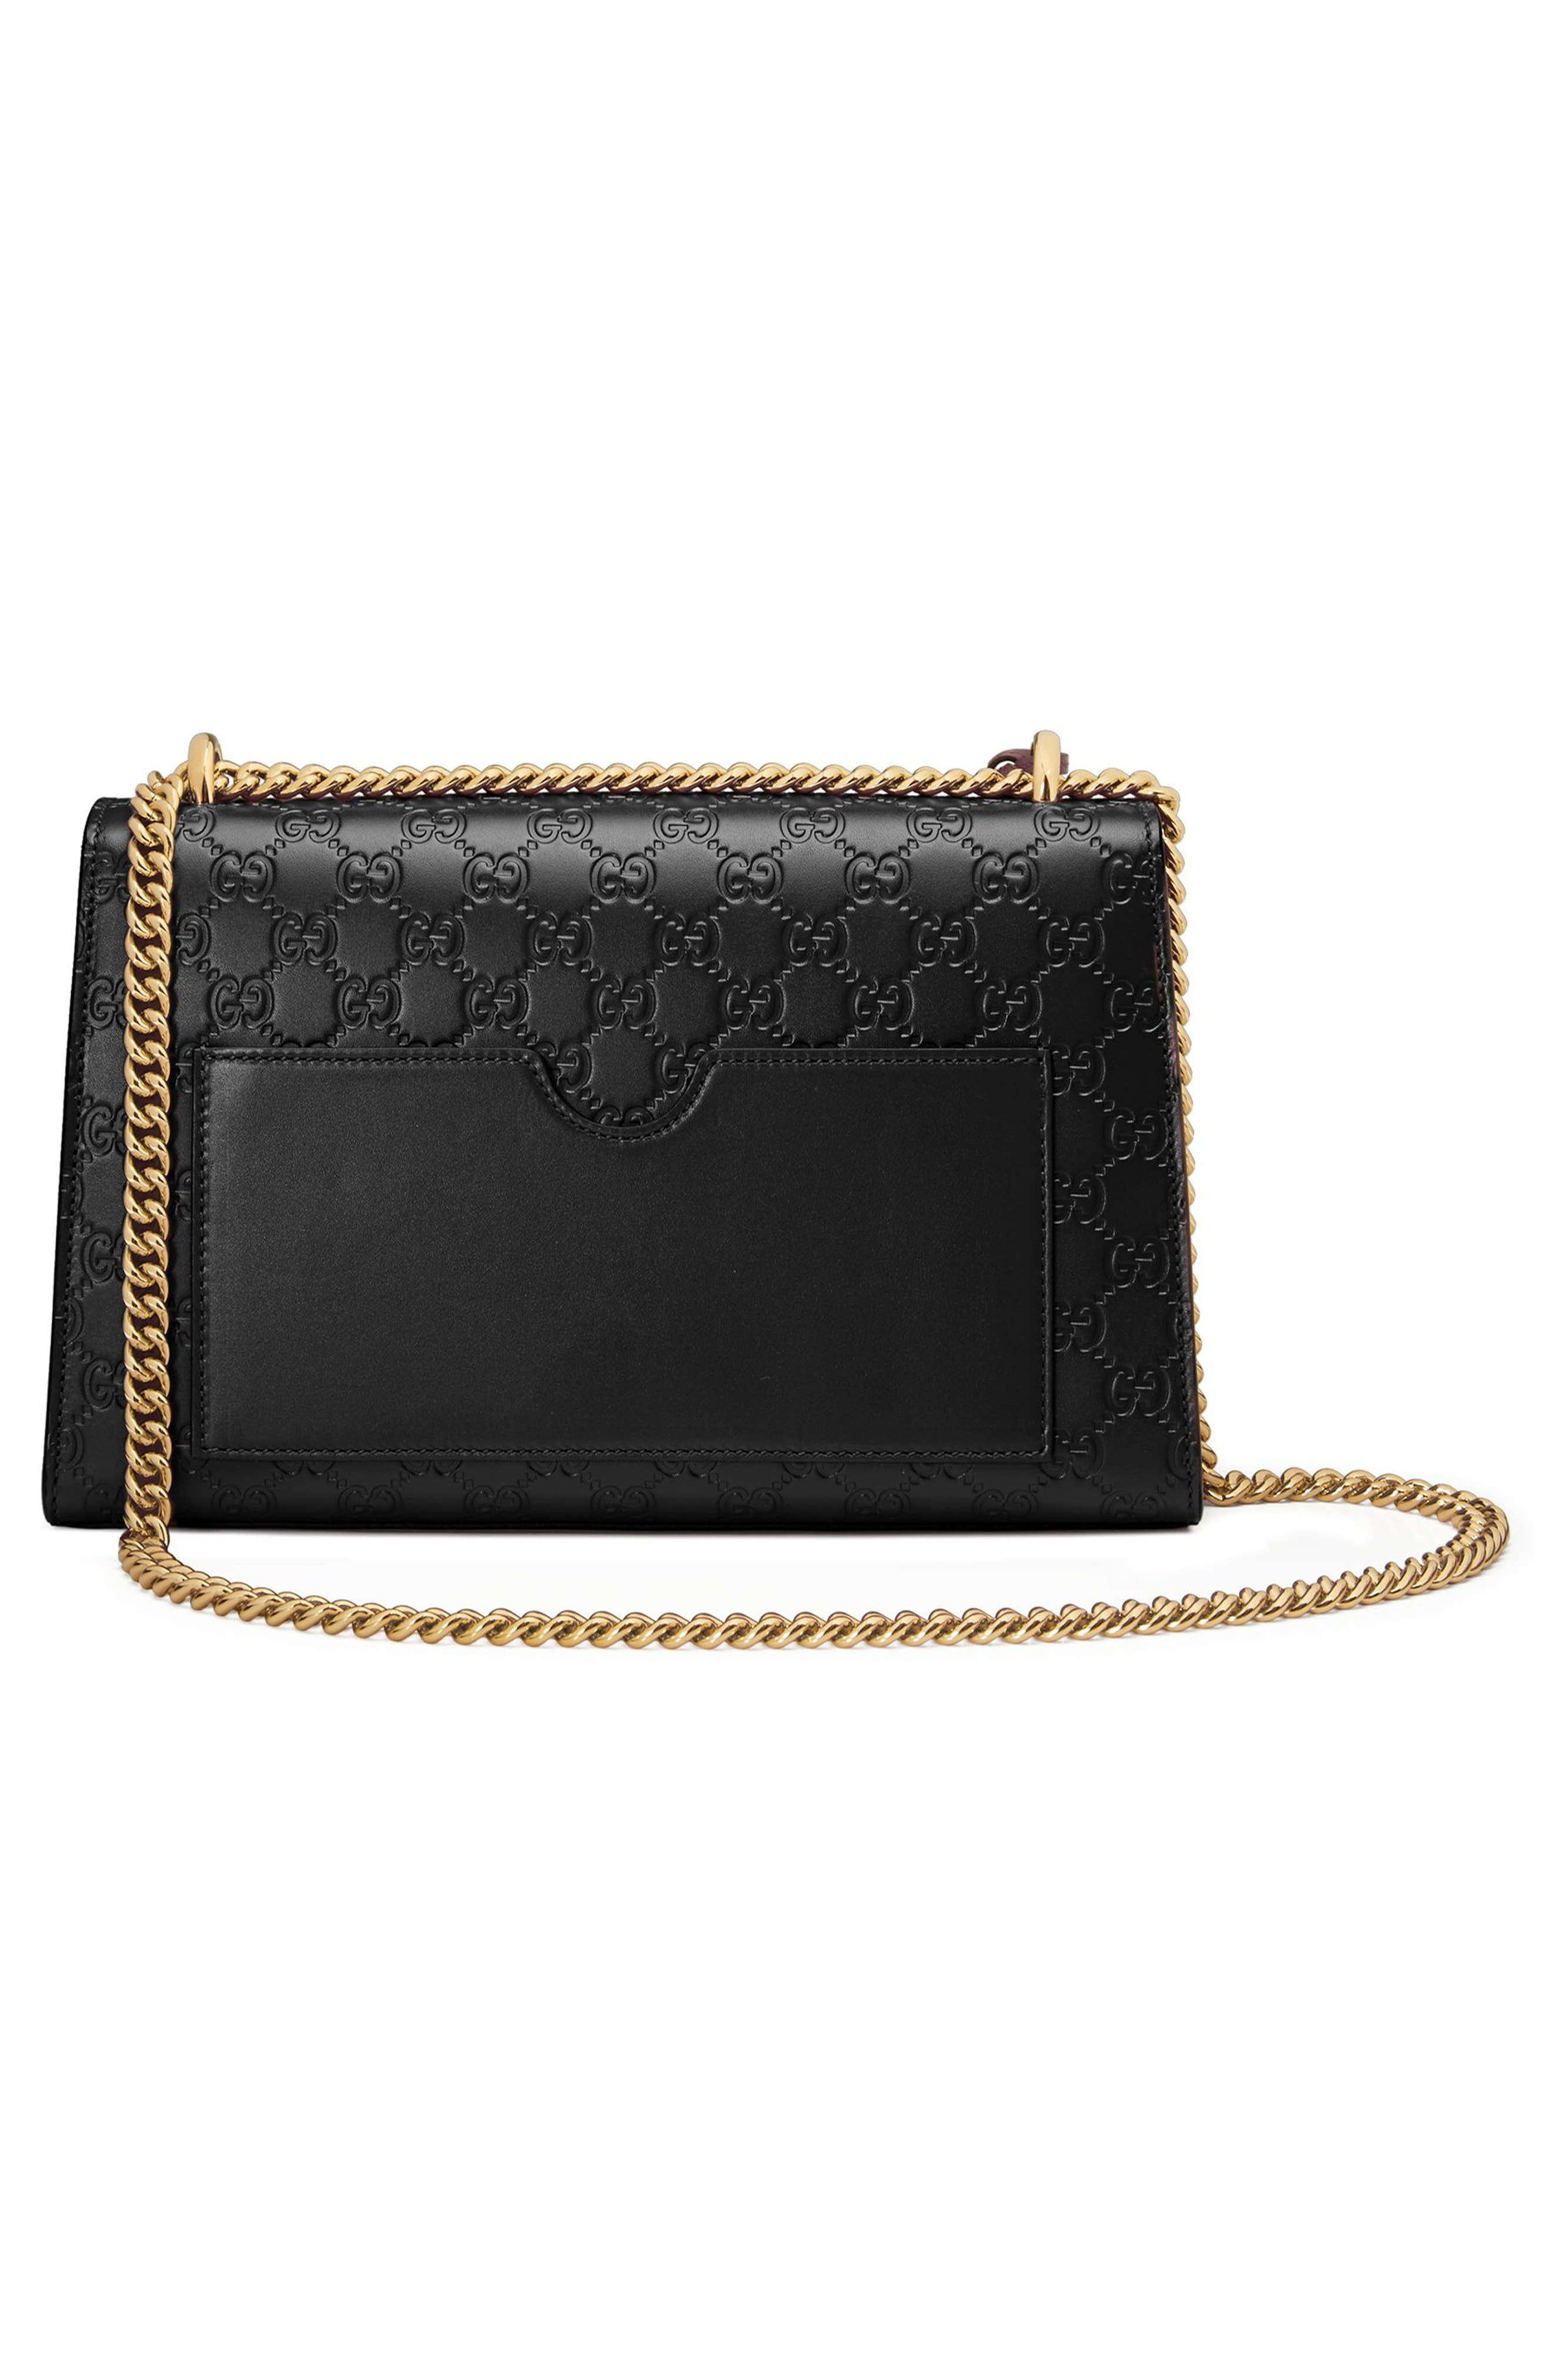 Medium Padlock Signature Leather Shoulder Bag,                             Alternate thumbnail 2, color,                             NERO